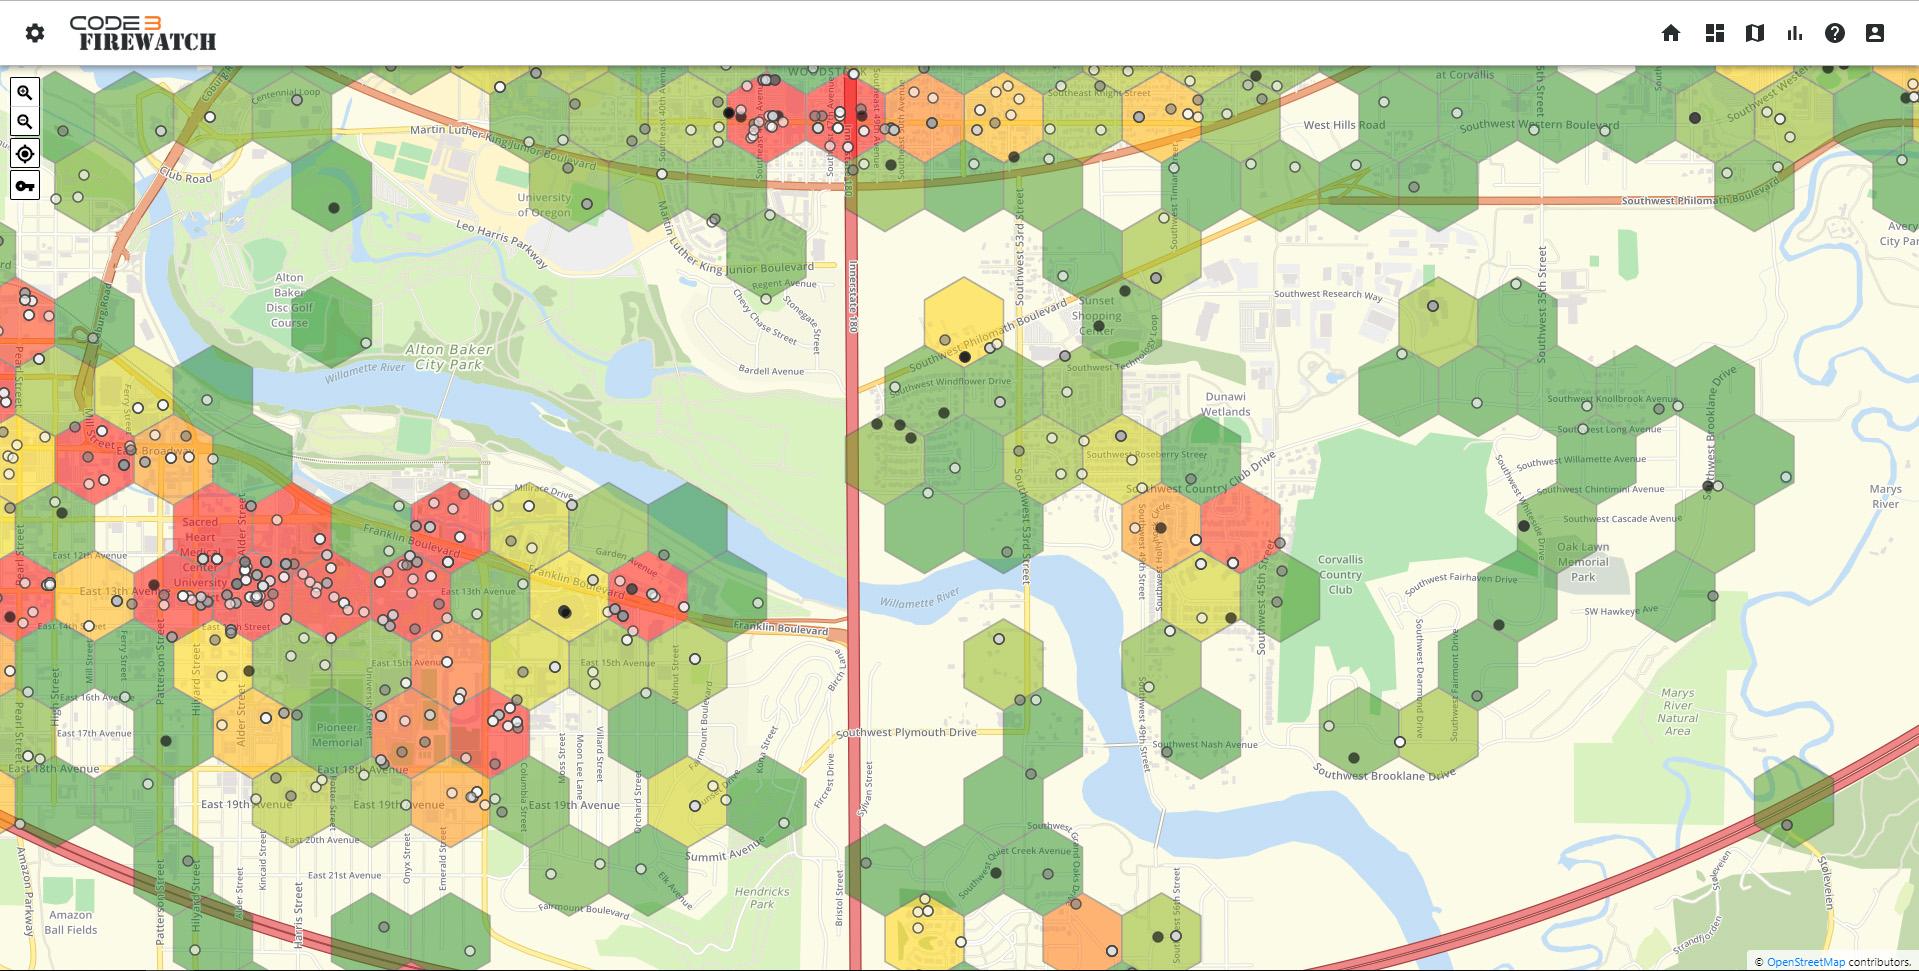 Code3 Firewatch map